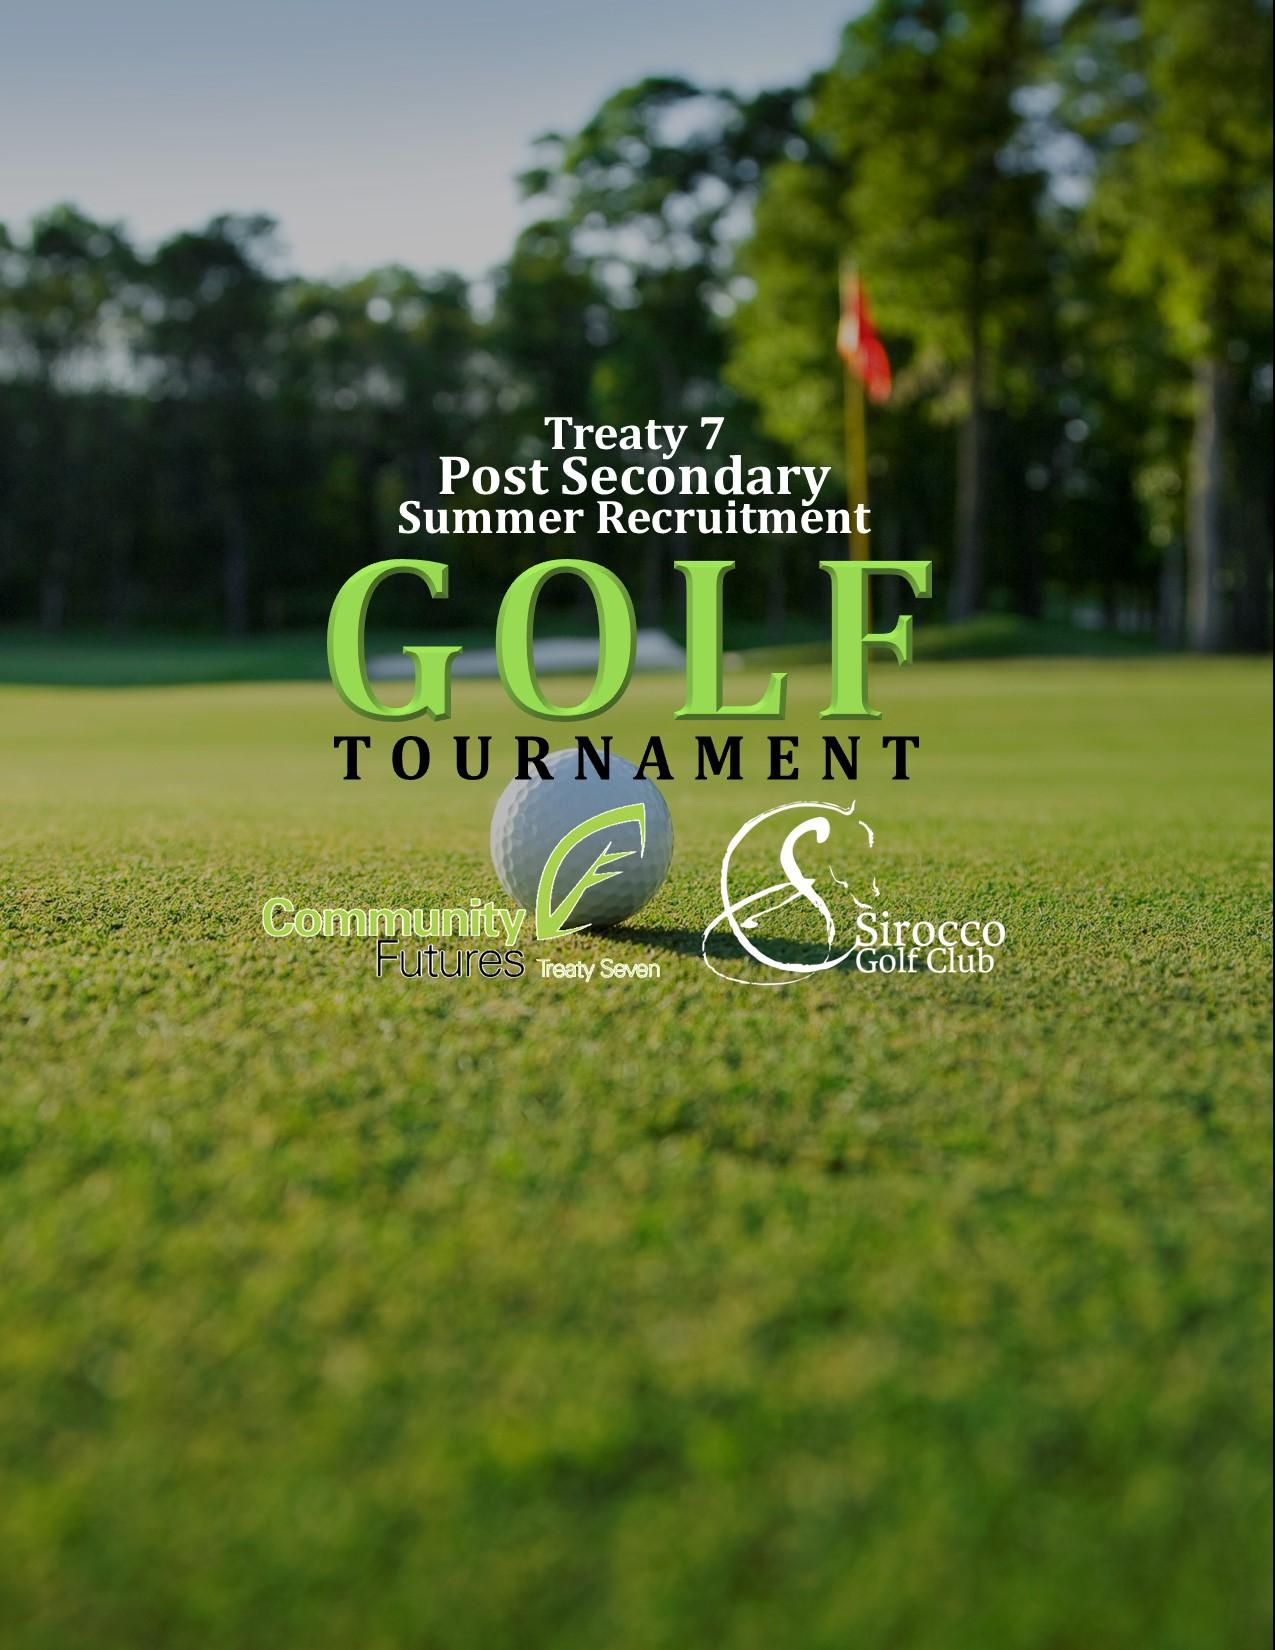 Treaty 7 Post Secondary Summer Recruitment Golf Tournament